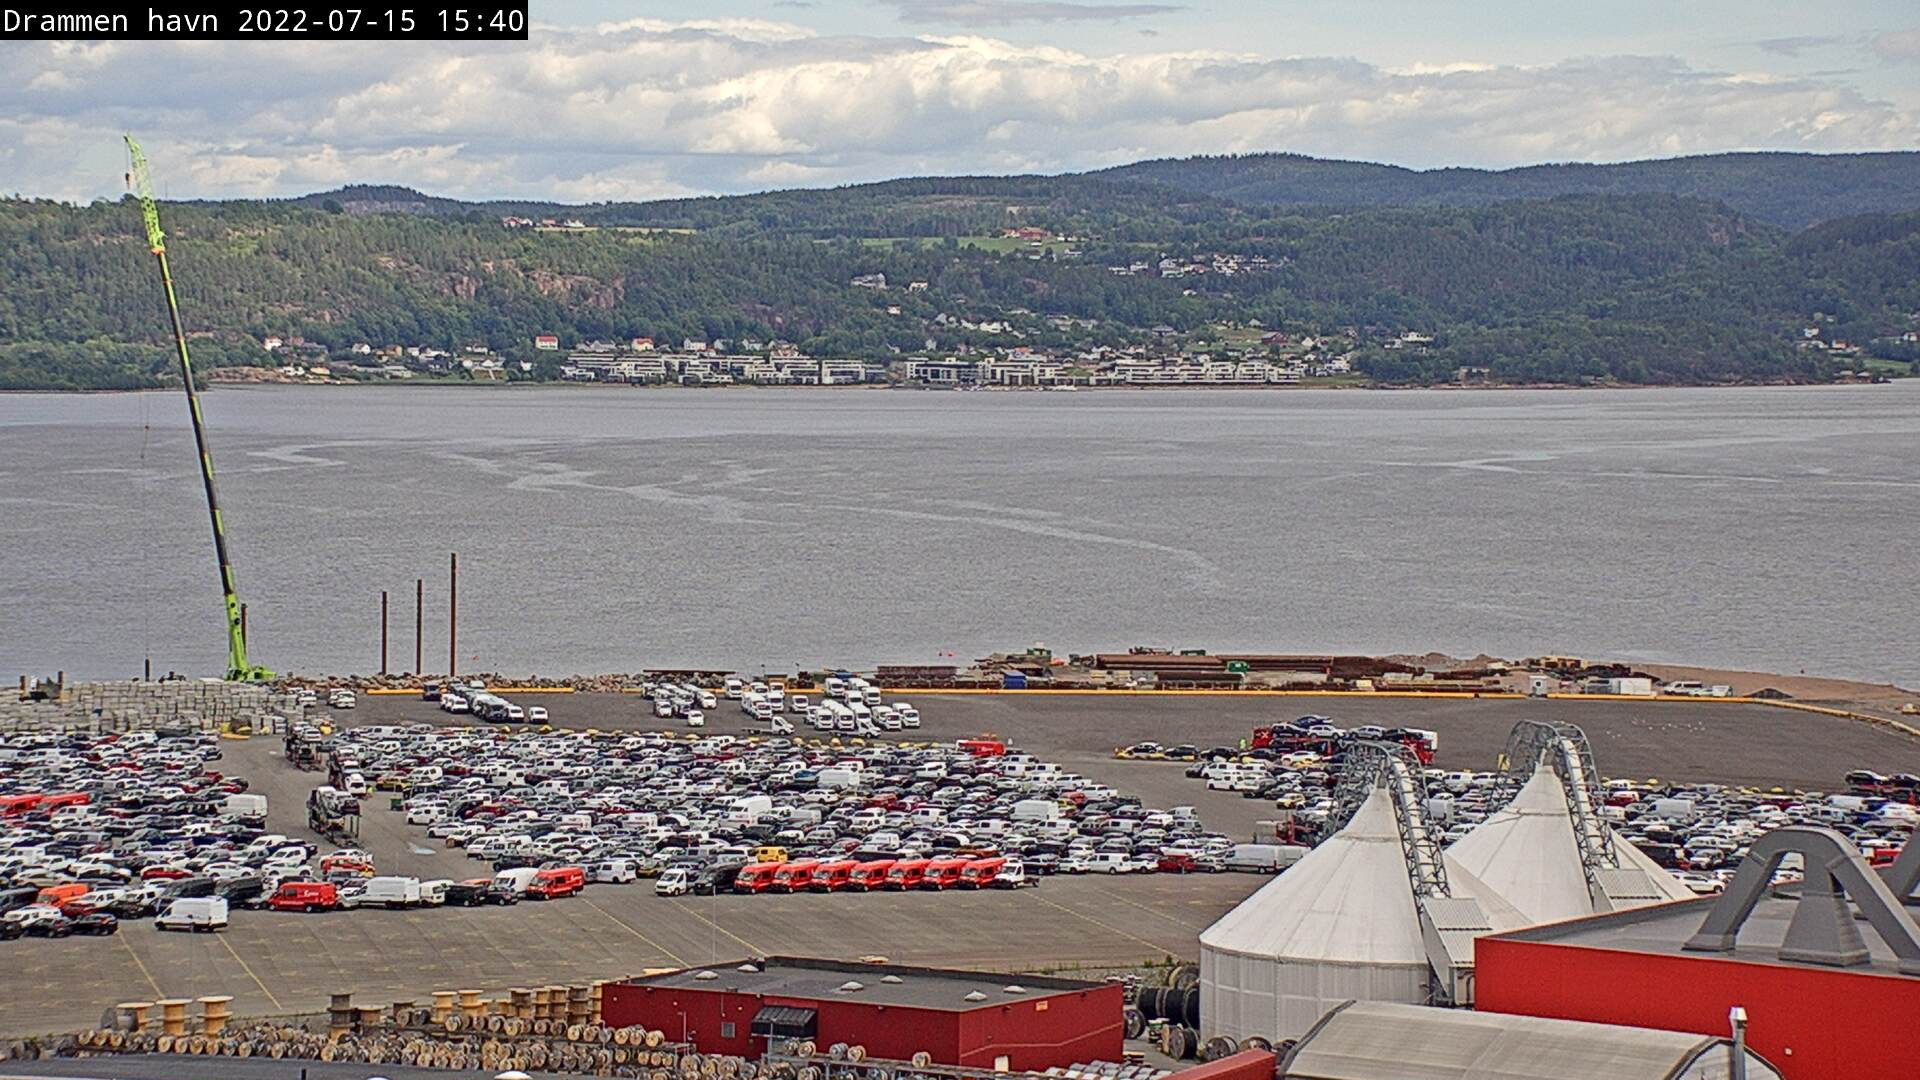 Webkamera Drammen havn